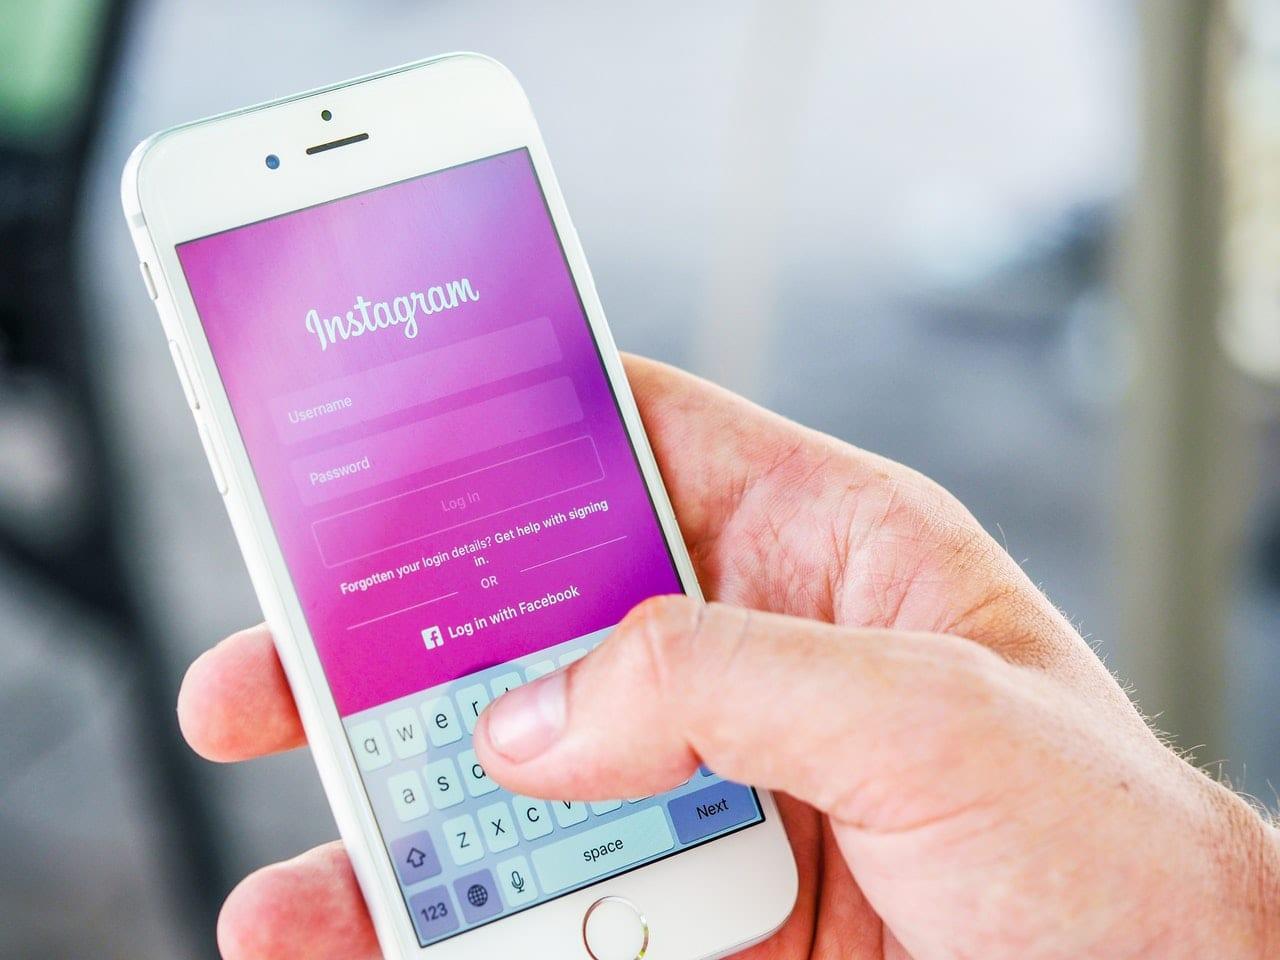 Opvallen met social media: Tips en tricks